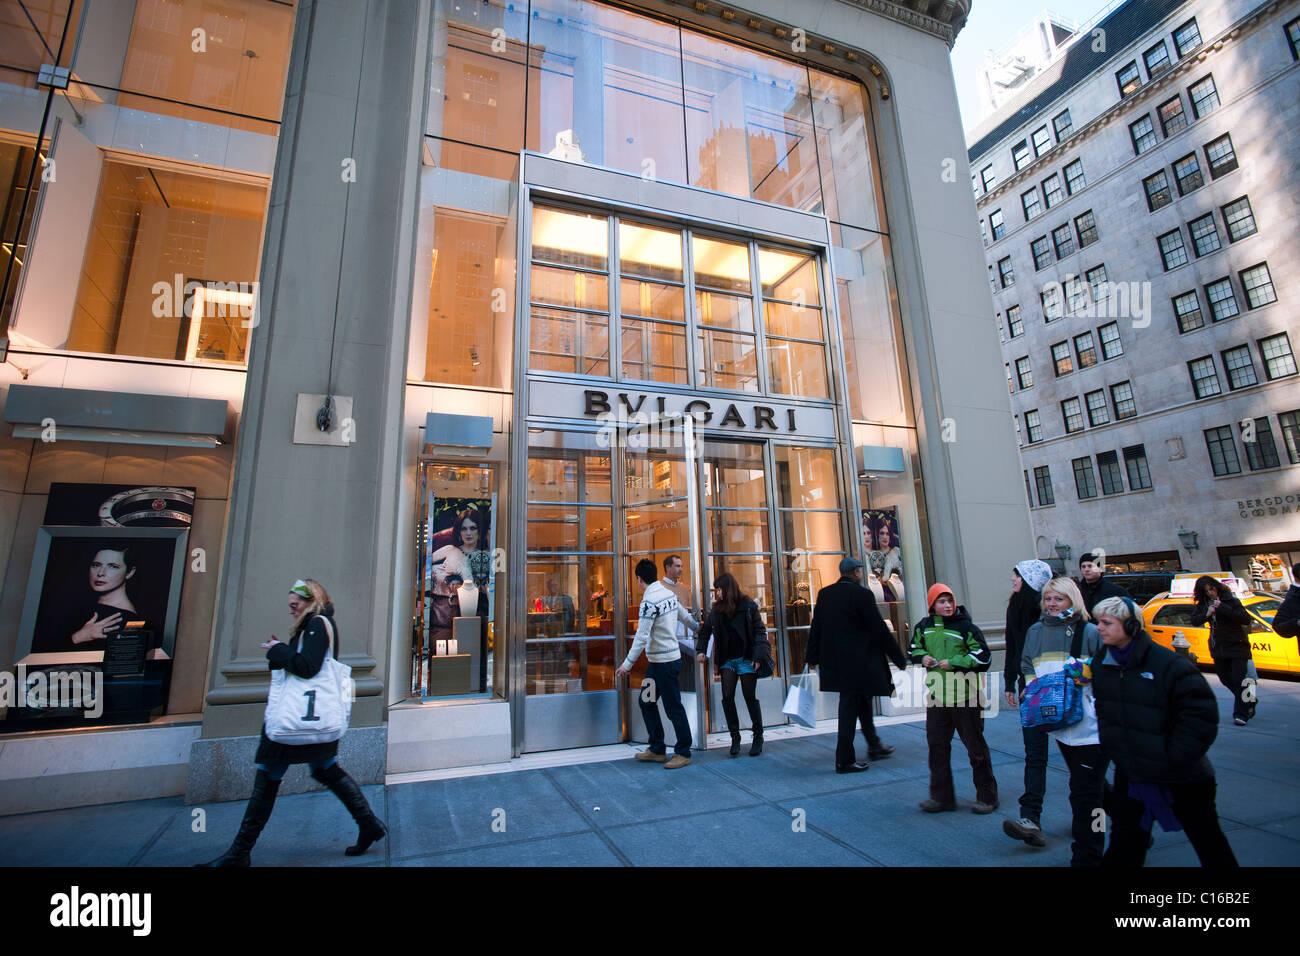 Bulgari Retail High Resolution Stock Photography and ...